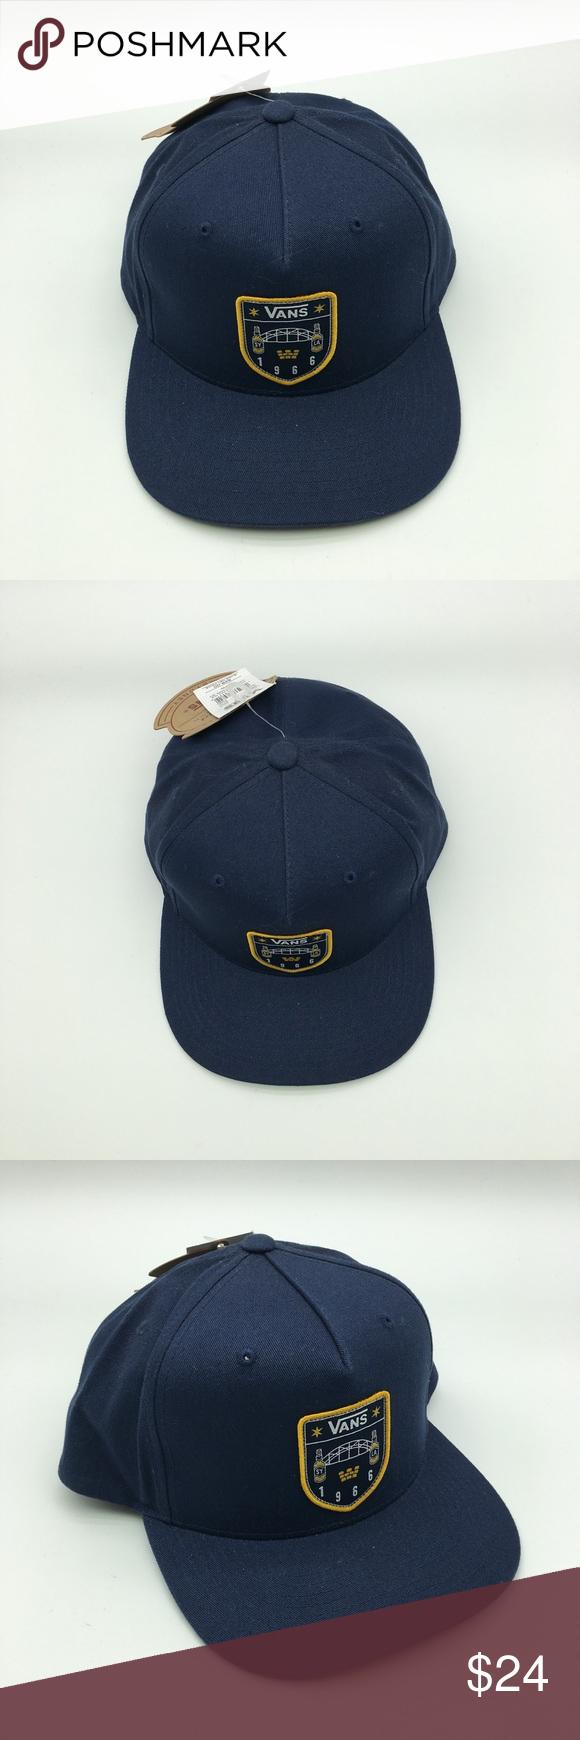 1985d701408 Vans SnapBack. Vans SnapBack Vans Accessories Hats